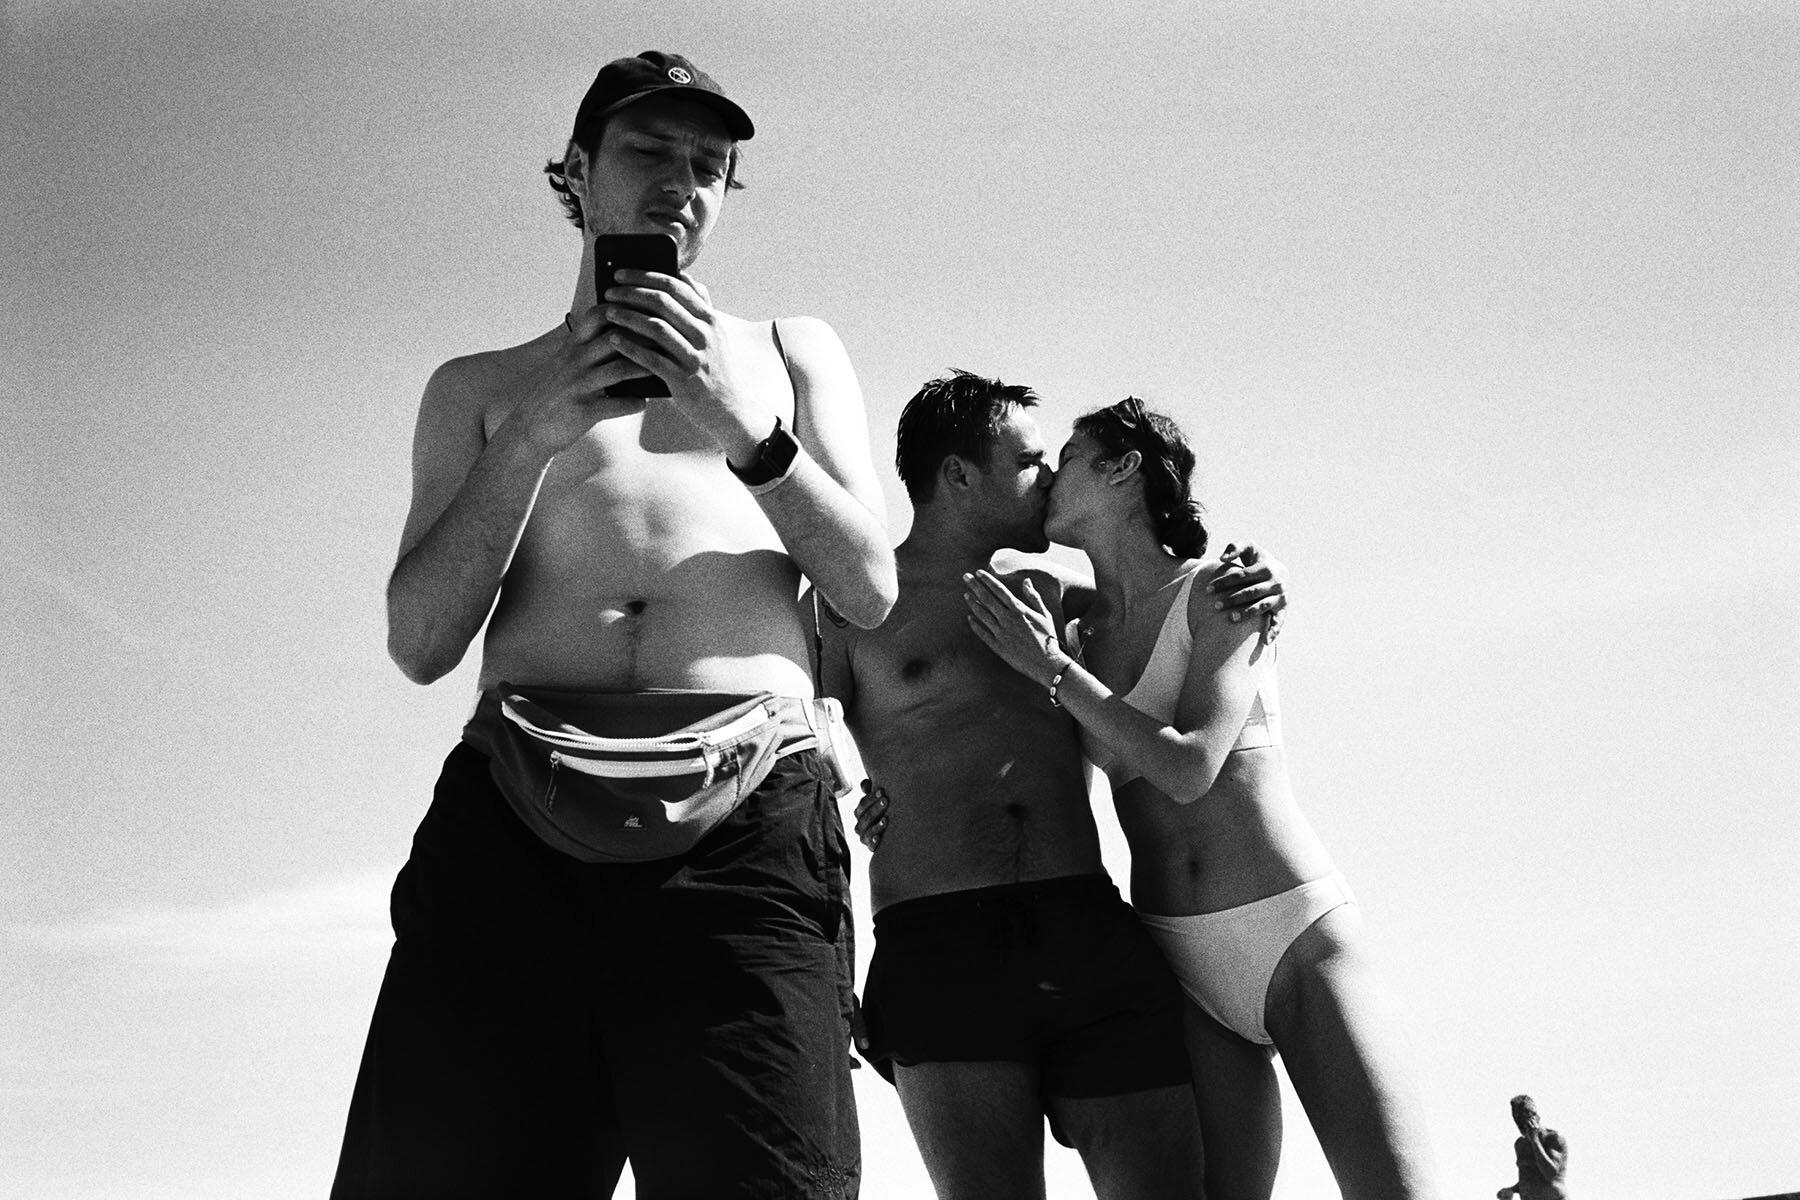 Max, Sofiya & Egor